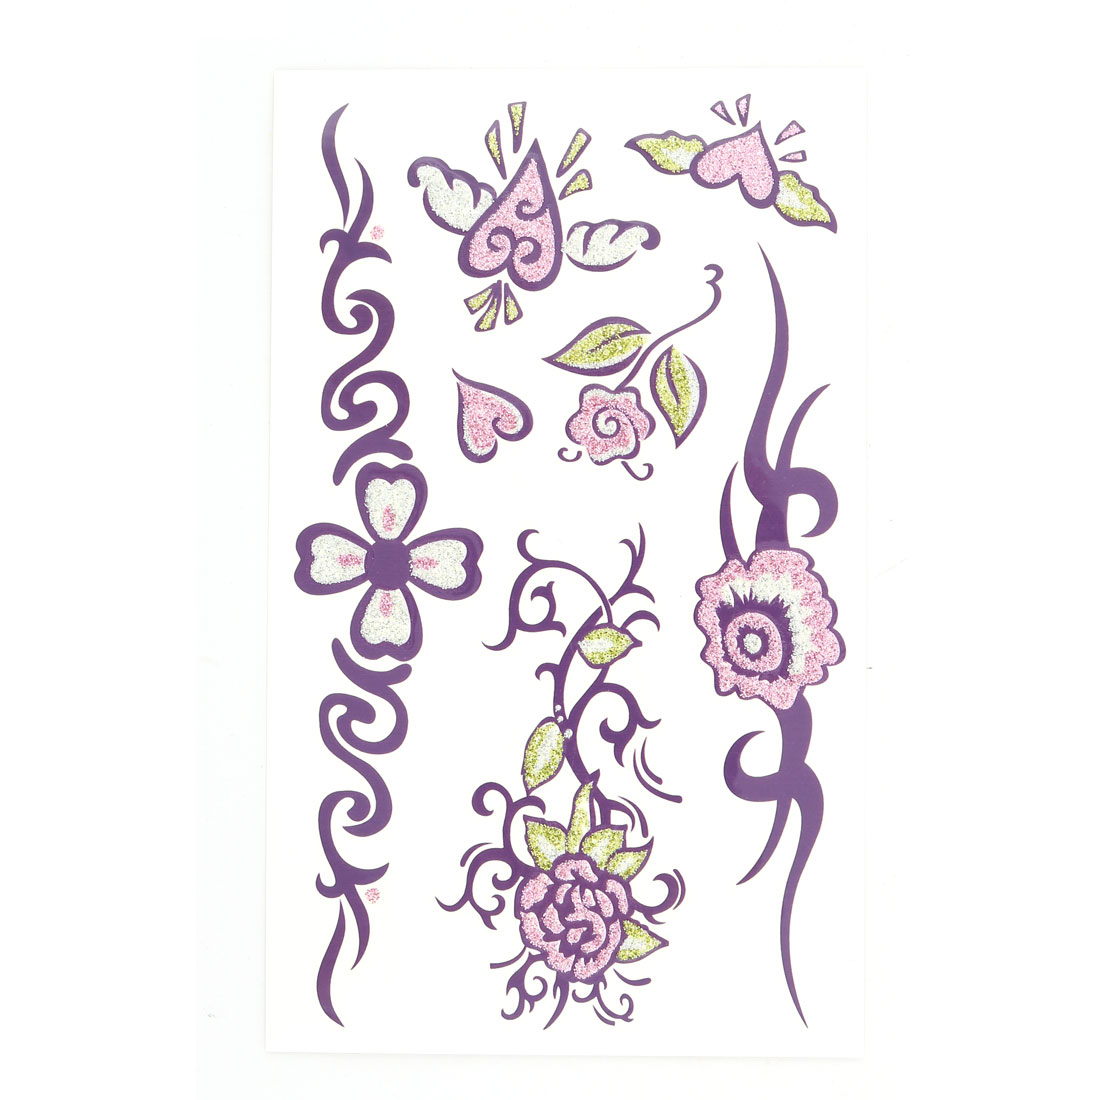 Lady Flower Vine Pattern Body Art Arm Paints Sticker Temporary Tattoo Sheet Multicolor